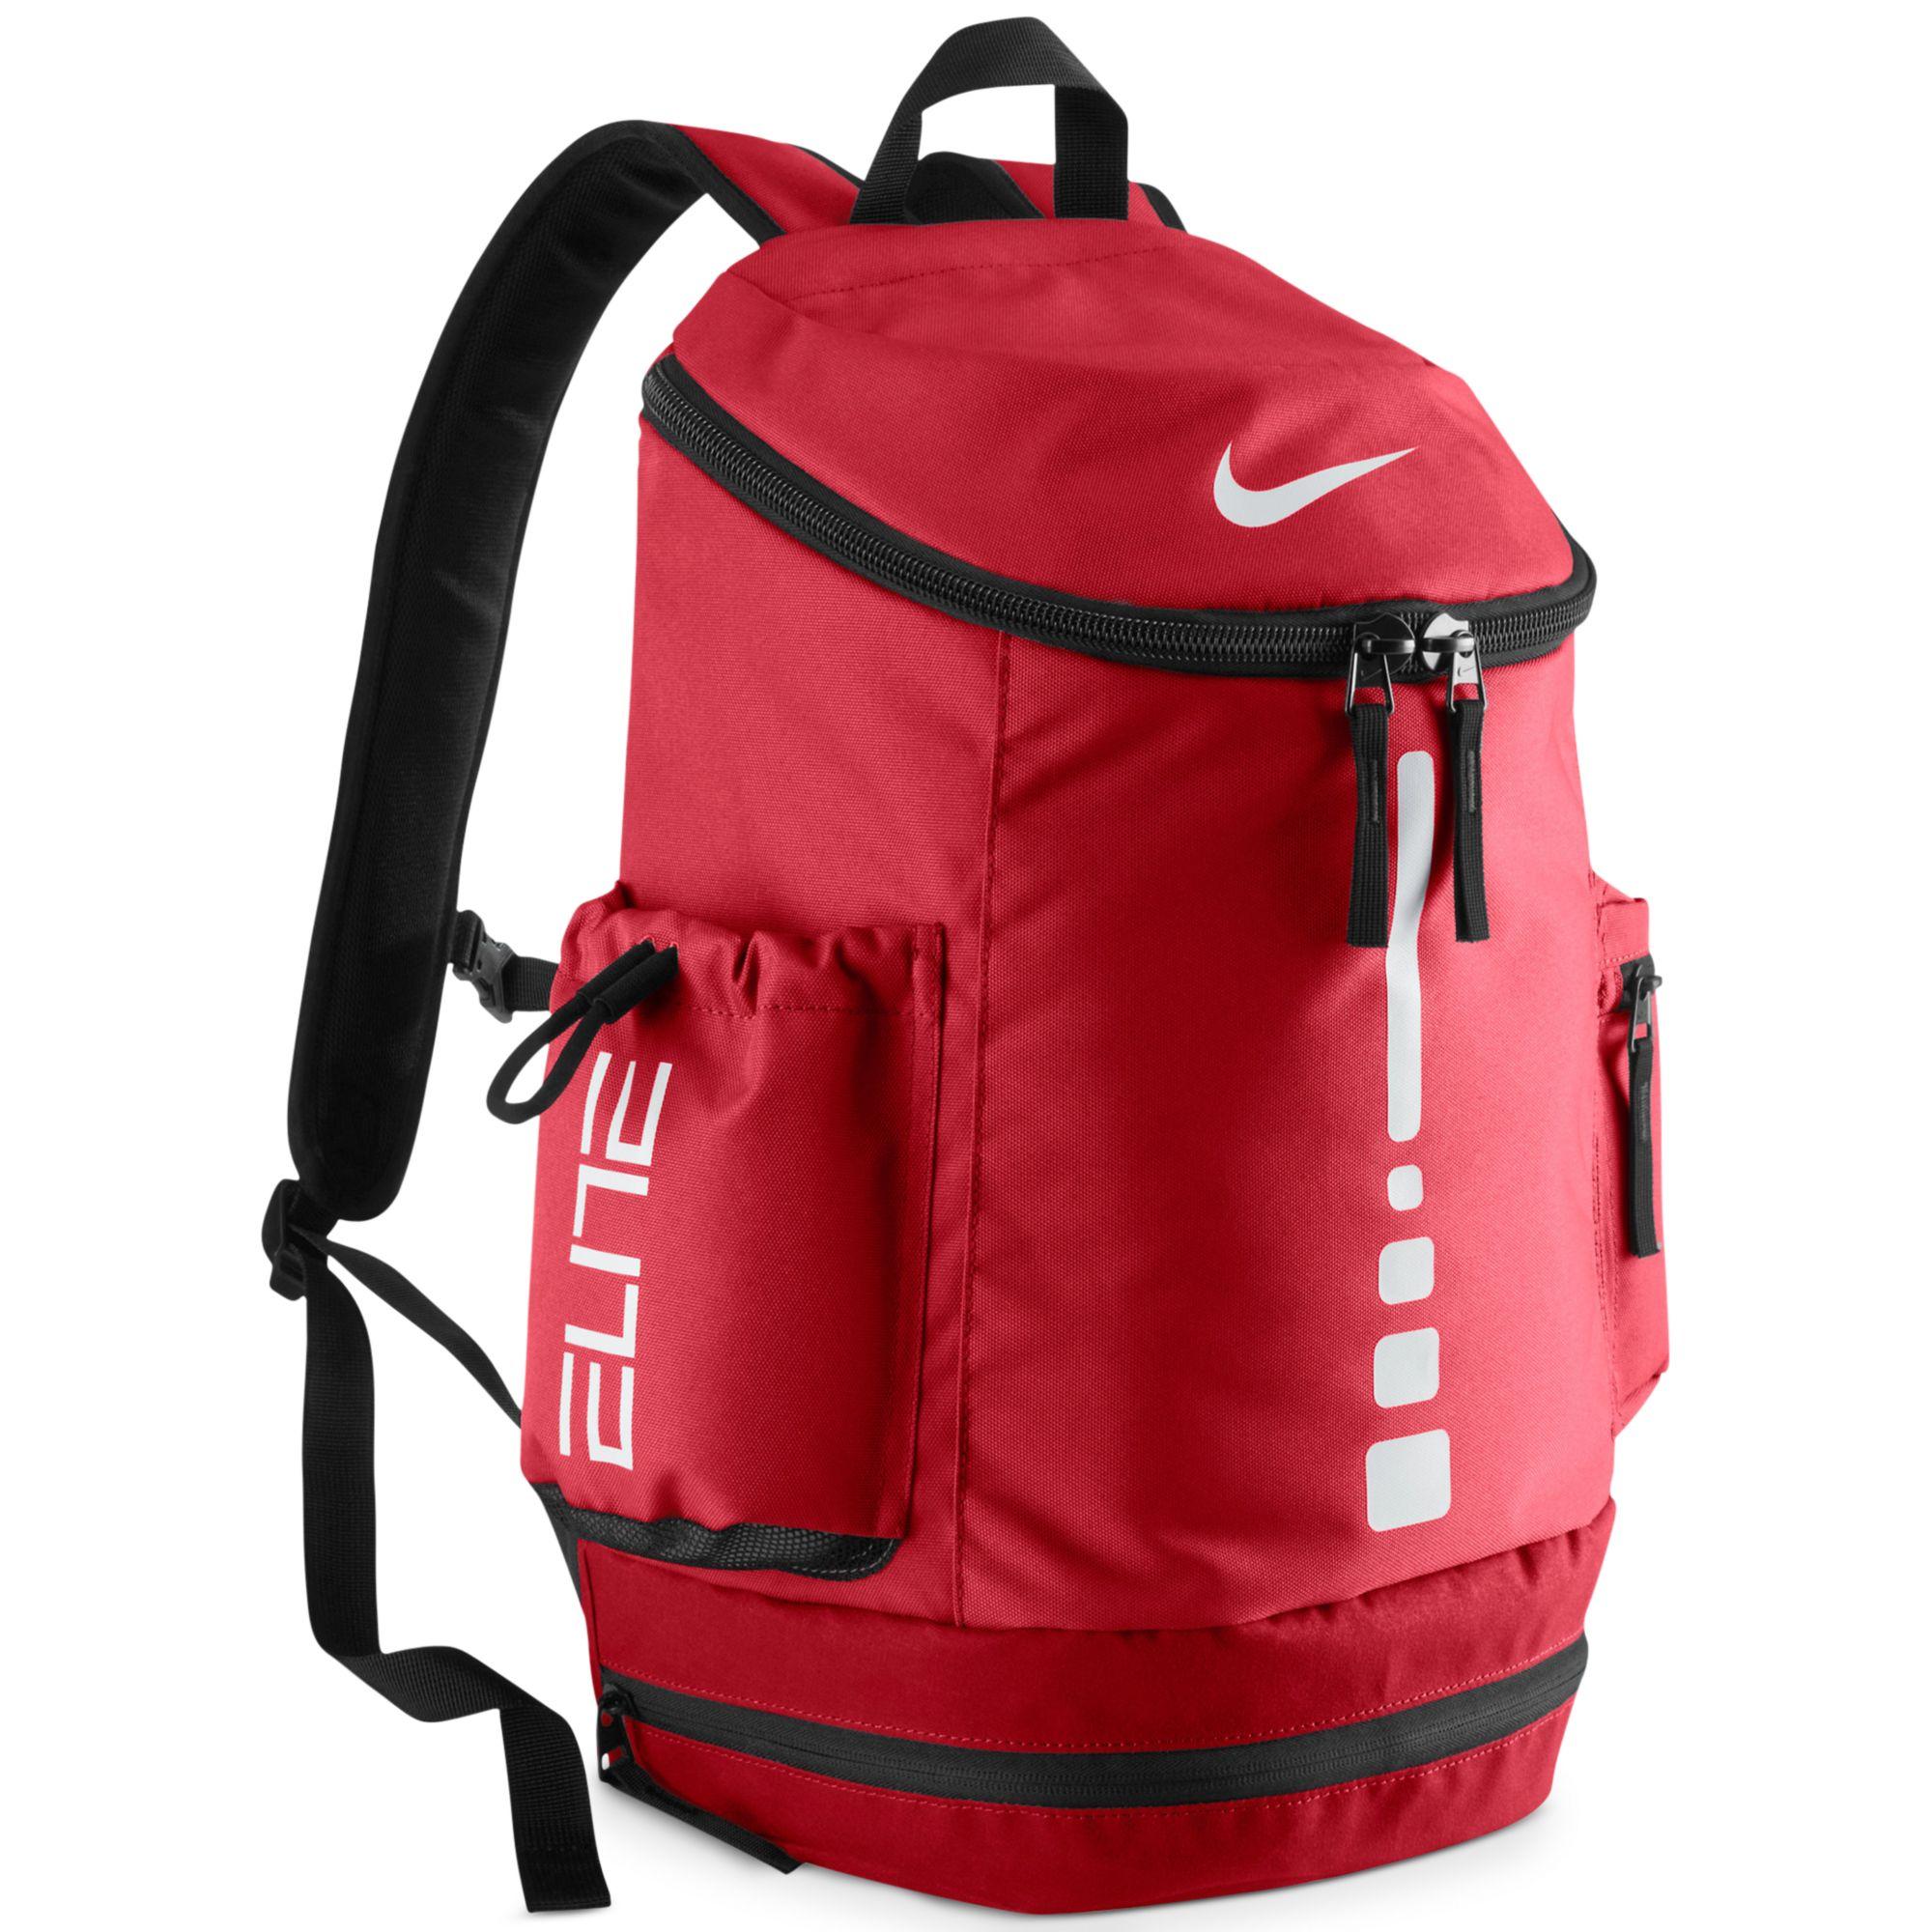 48c2a47c20b1 Lyst - Nike Hoops Elite Team Backpack in Red for Men